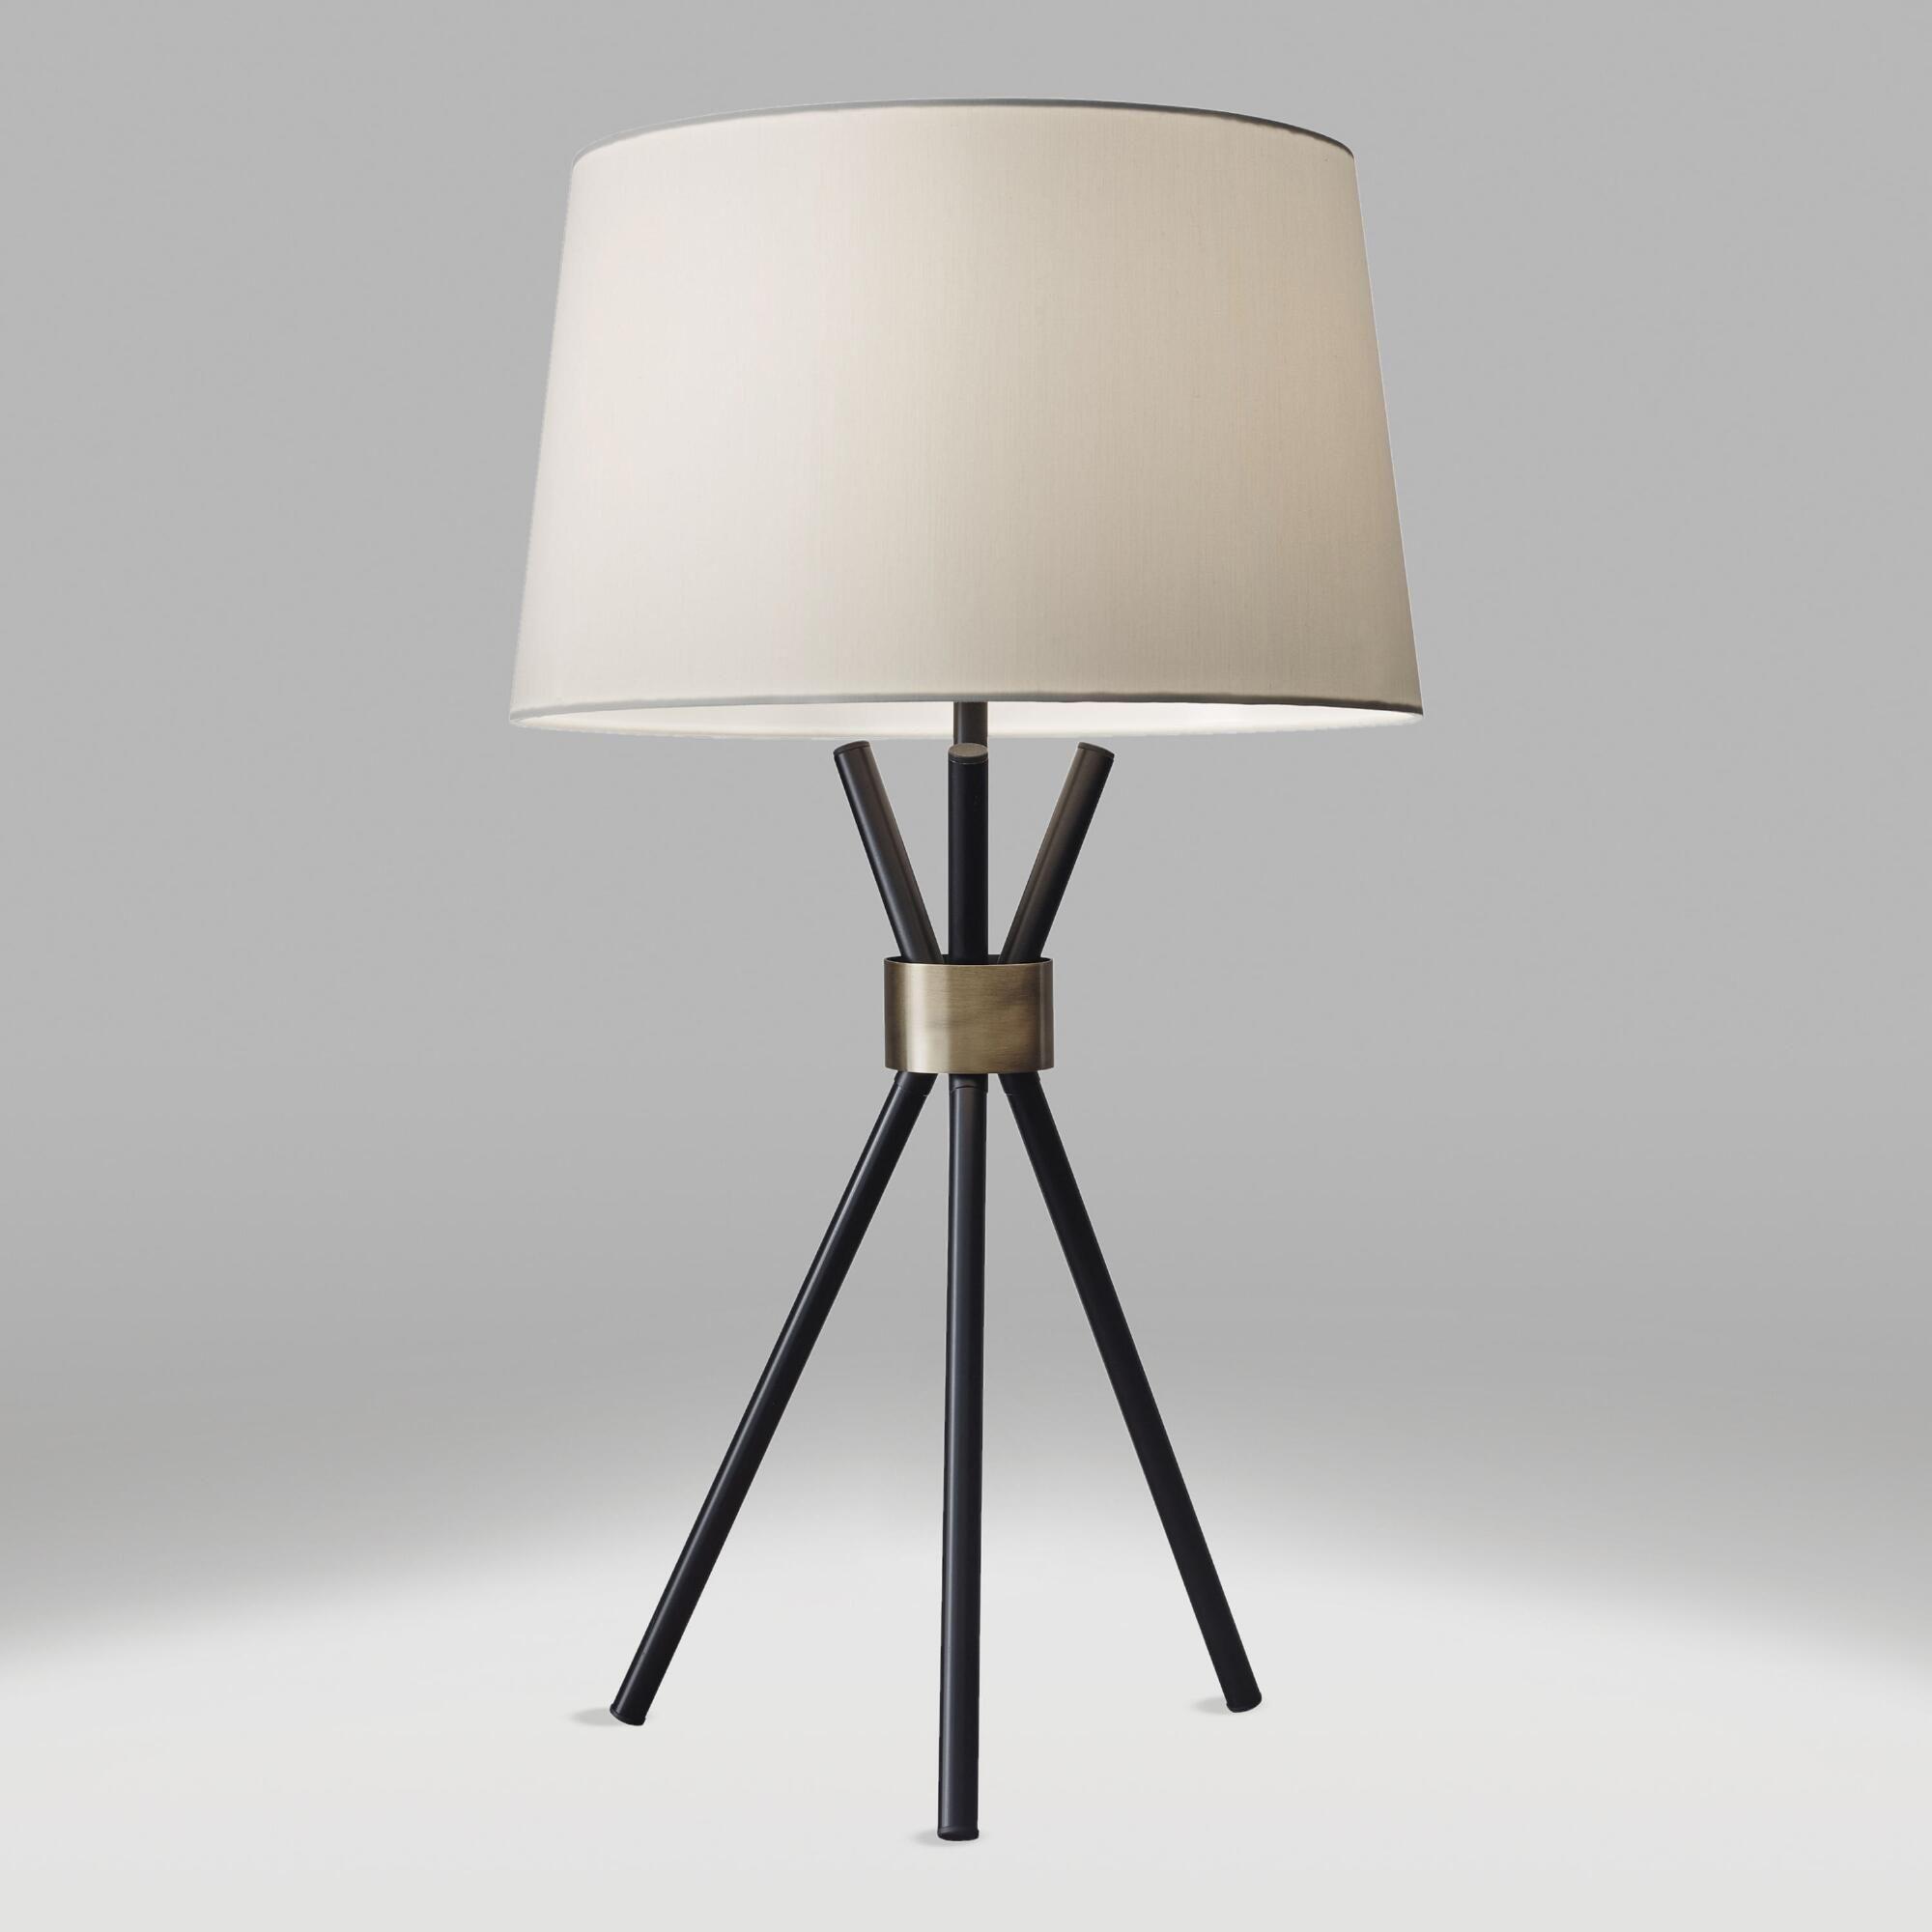 Black and Brass Tripod Kurt Table Lamp Black/Metallic by